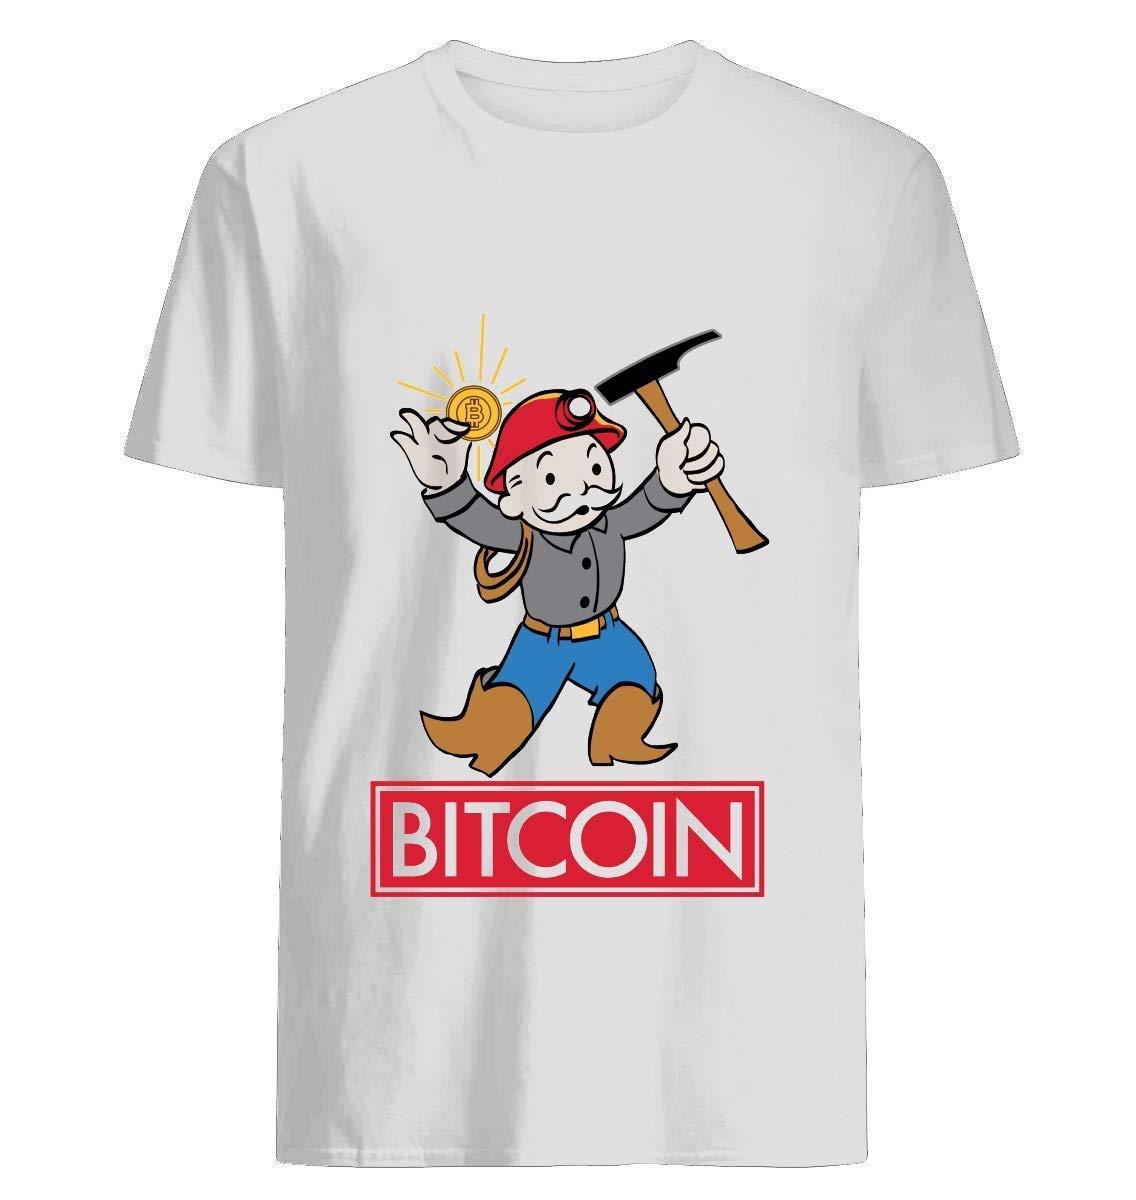 Bitcoin 91 T Shirt For Unisex